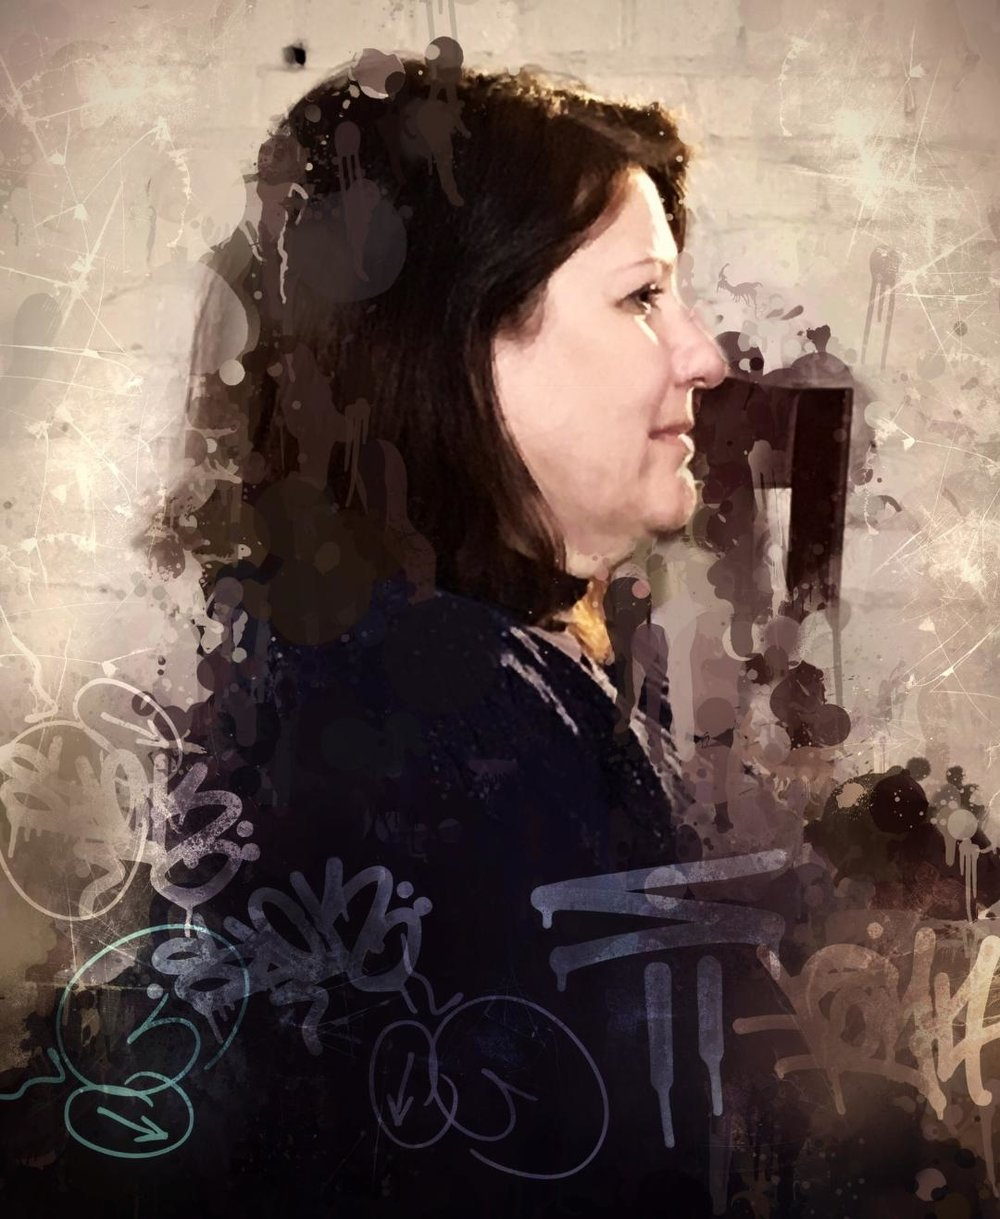 Nancy Dinger Aikins did this photo manipulation.